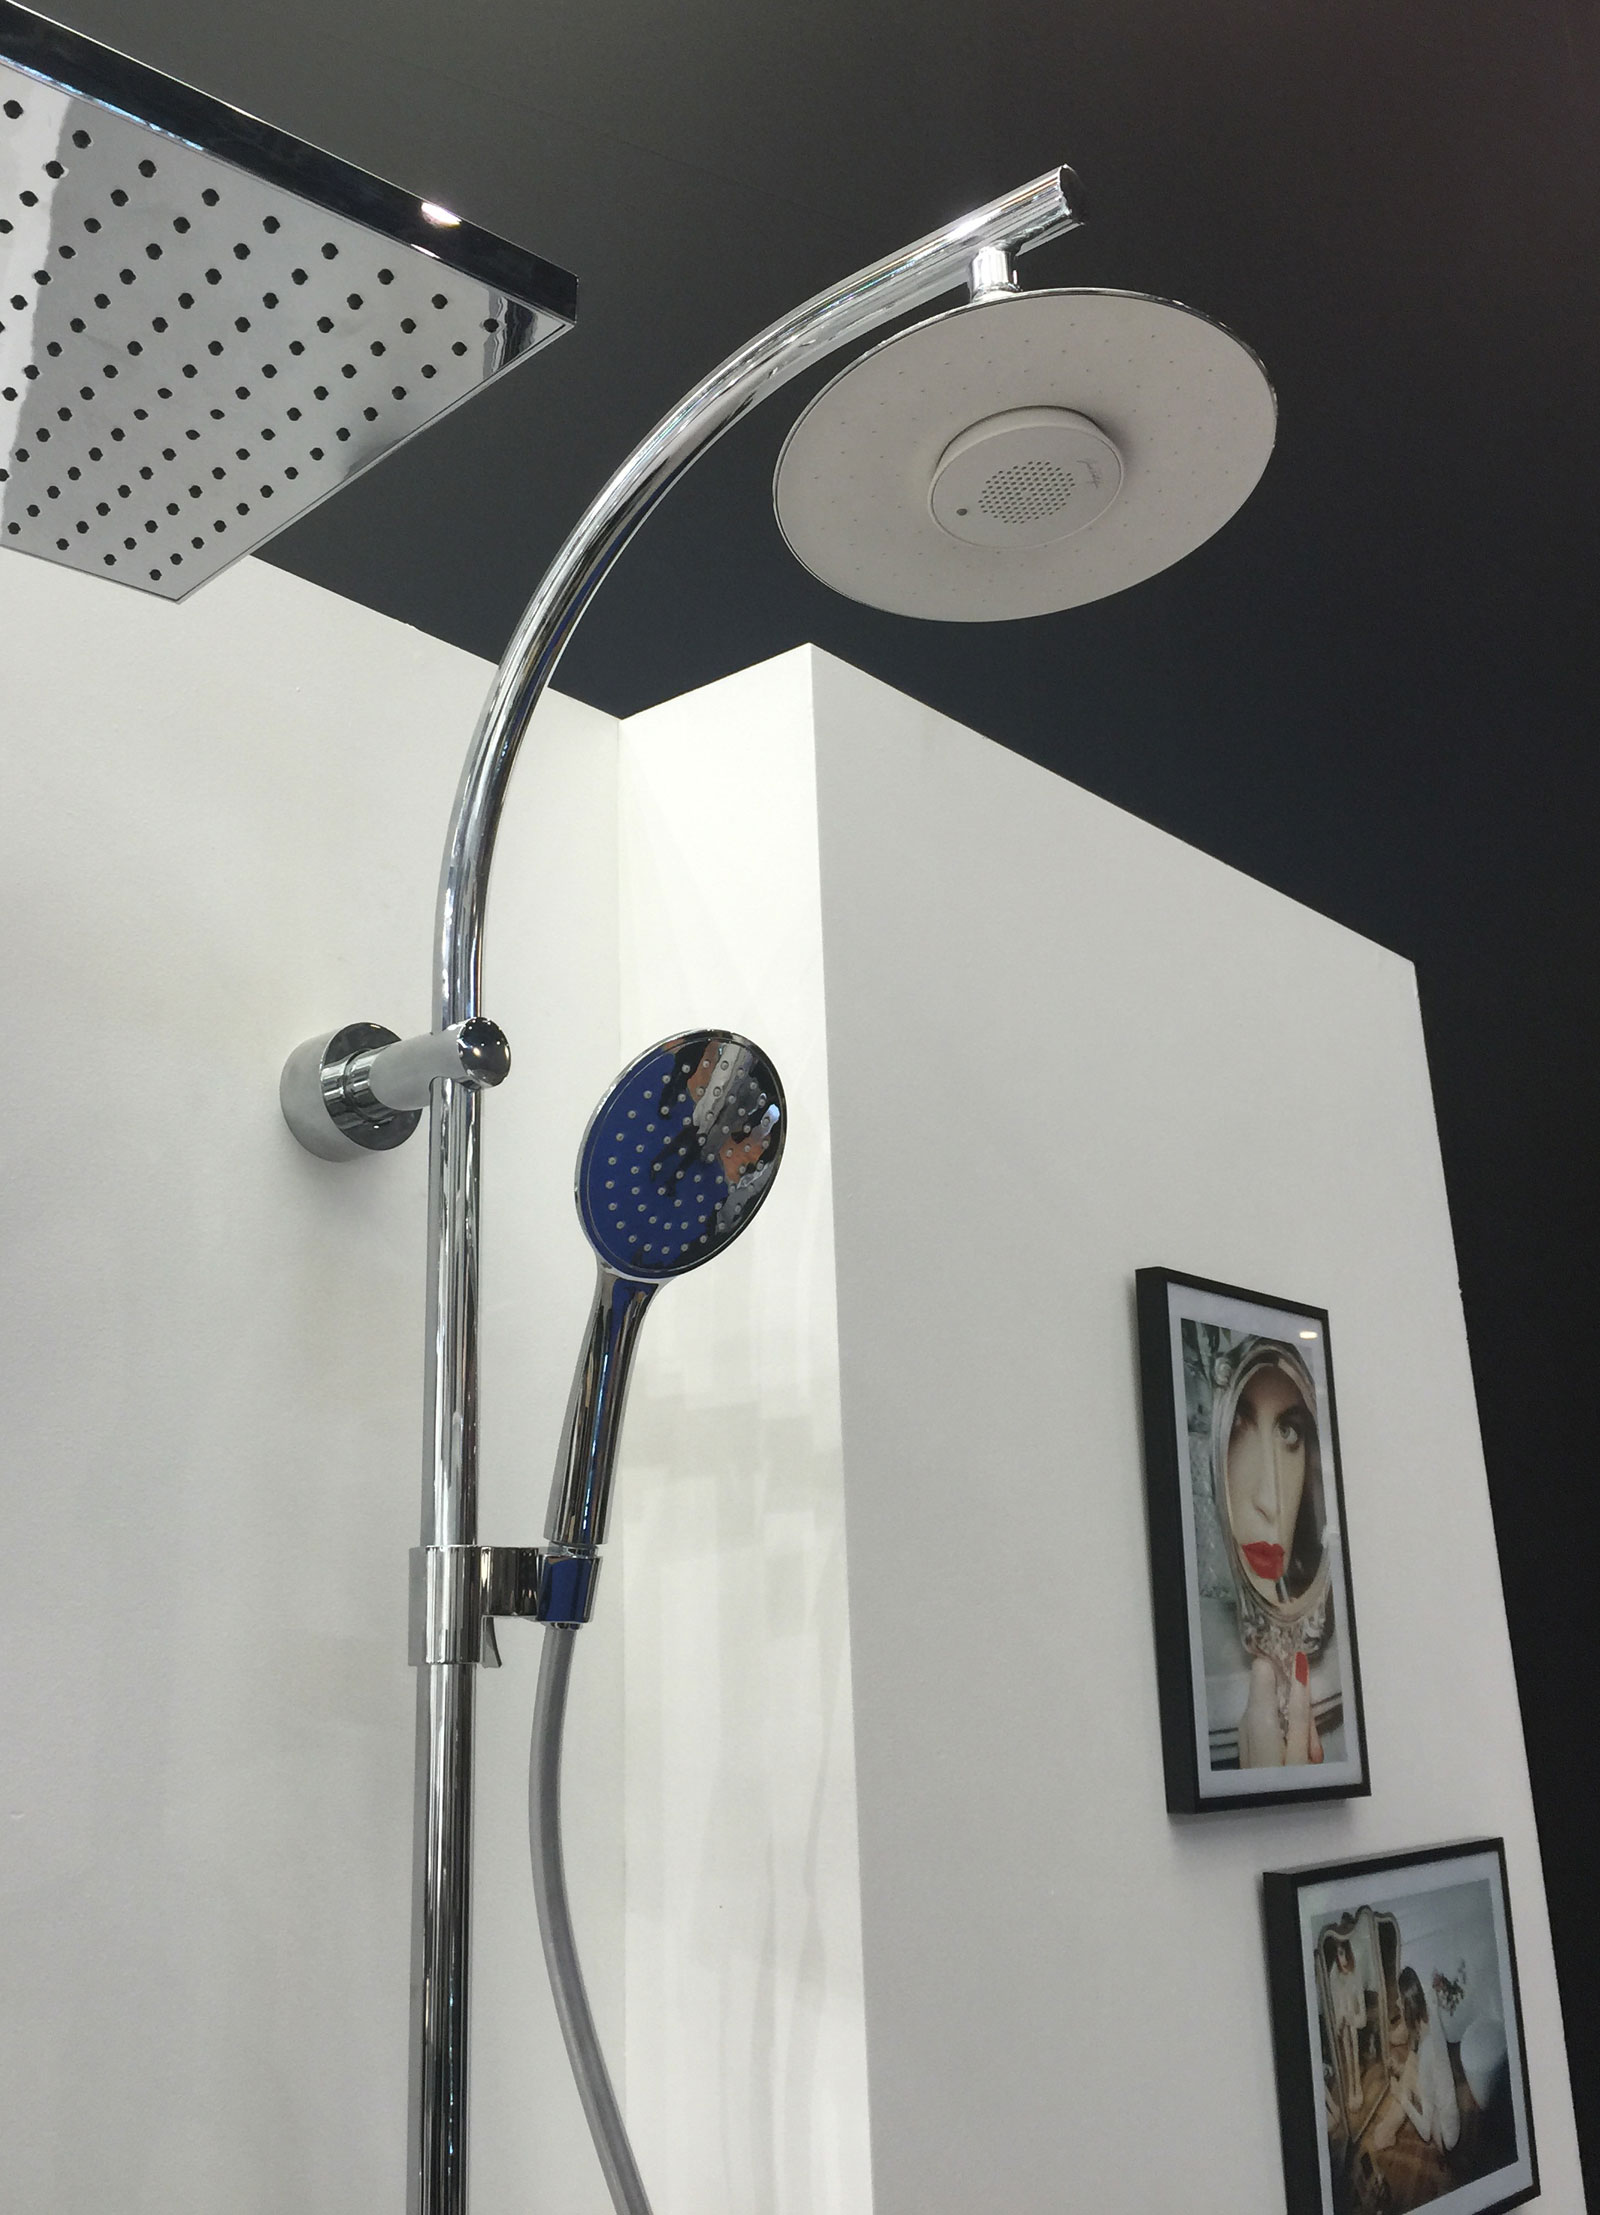 ideobain-jacob-delafon-stephanie-caumont salle de bain